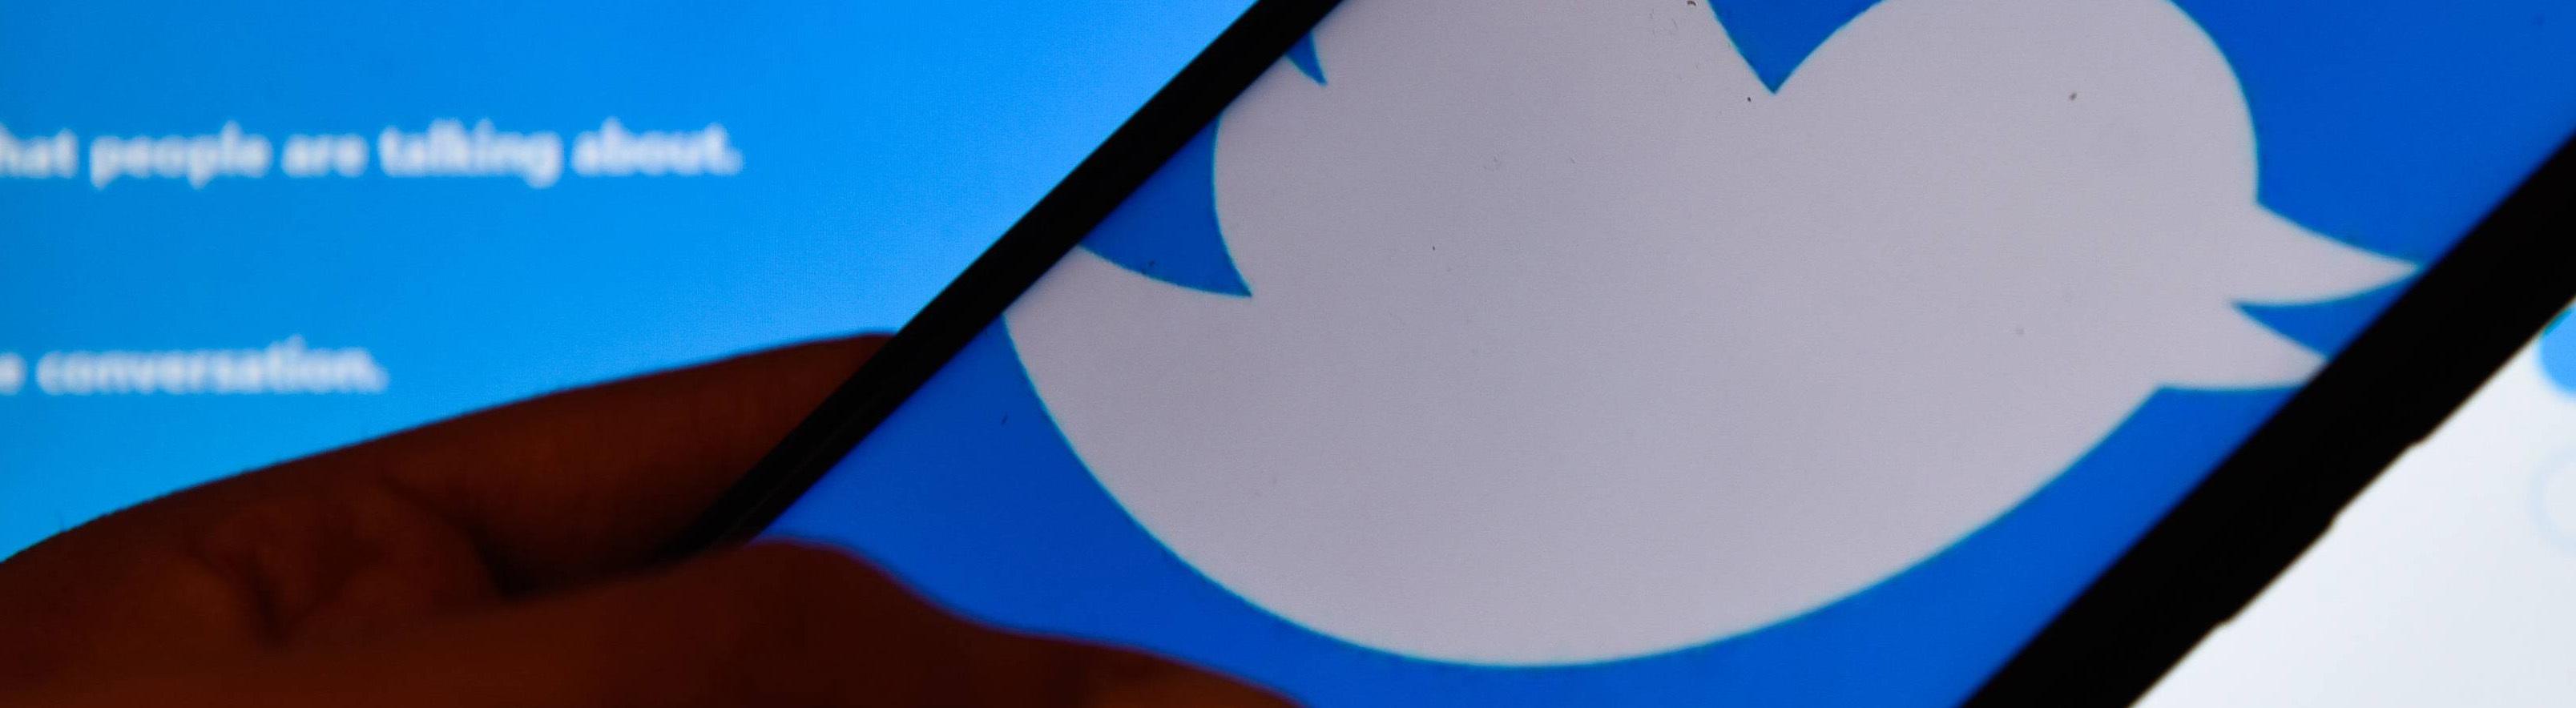 Symbolbild Twitter